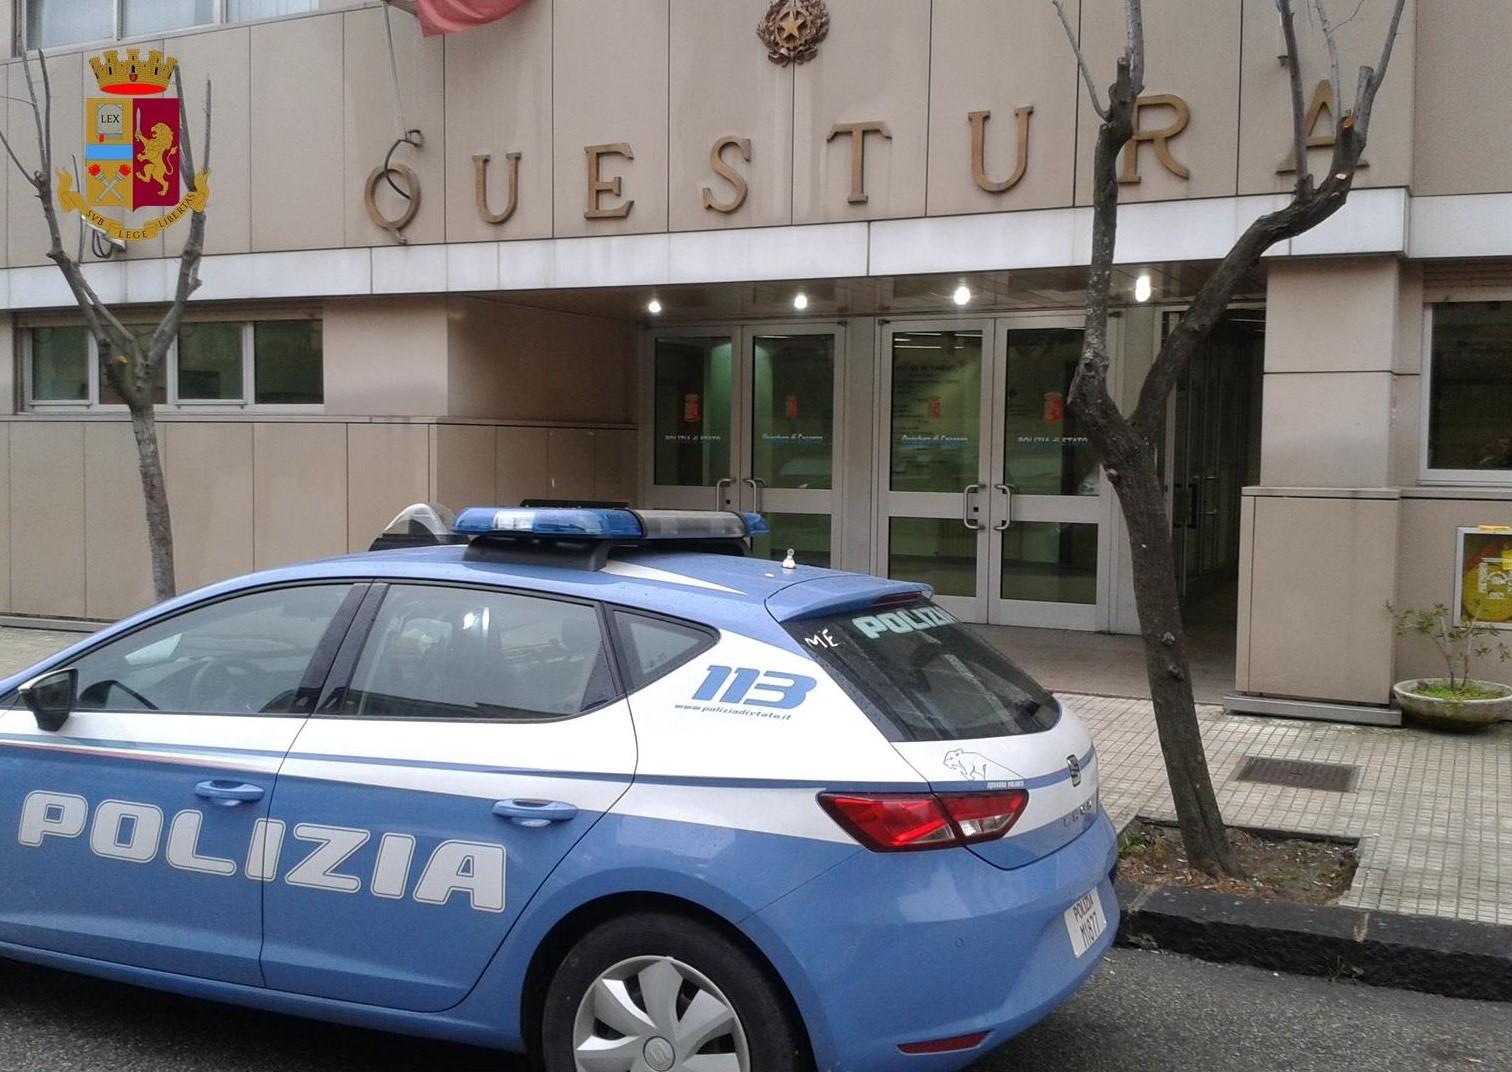 arresti_questura_1